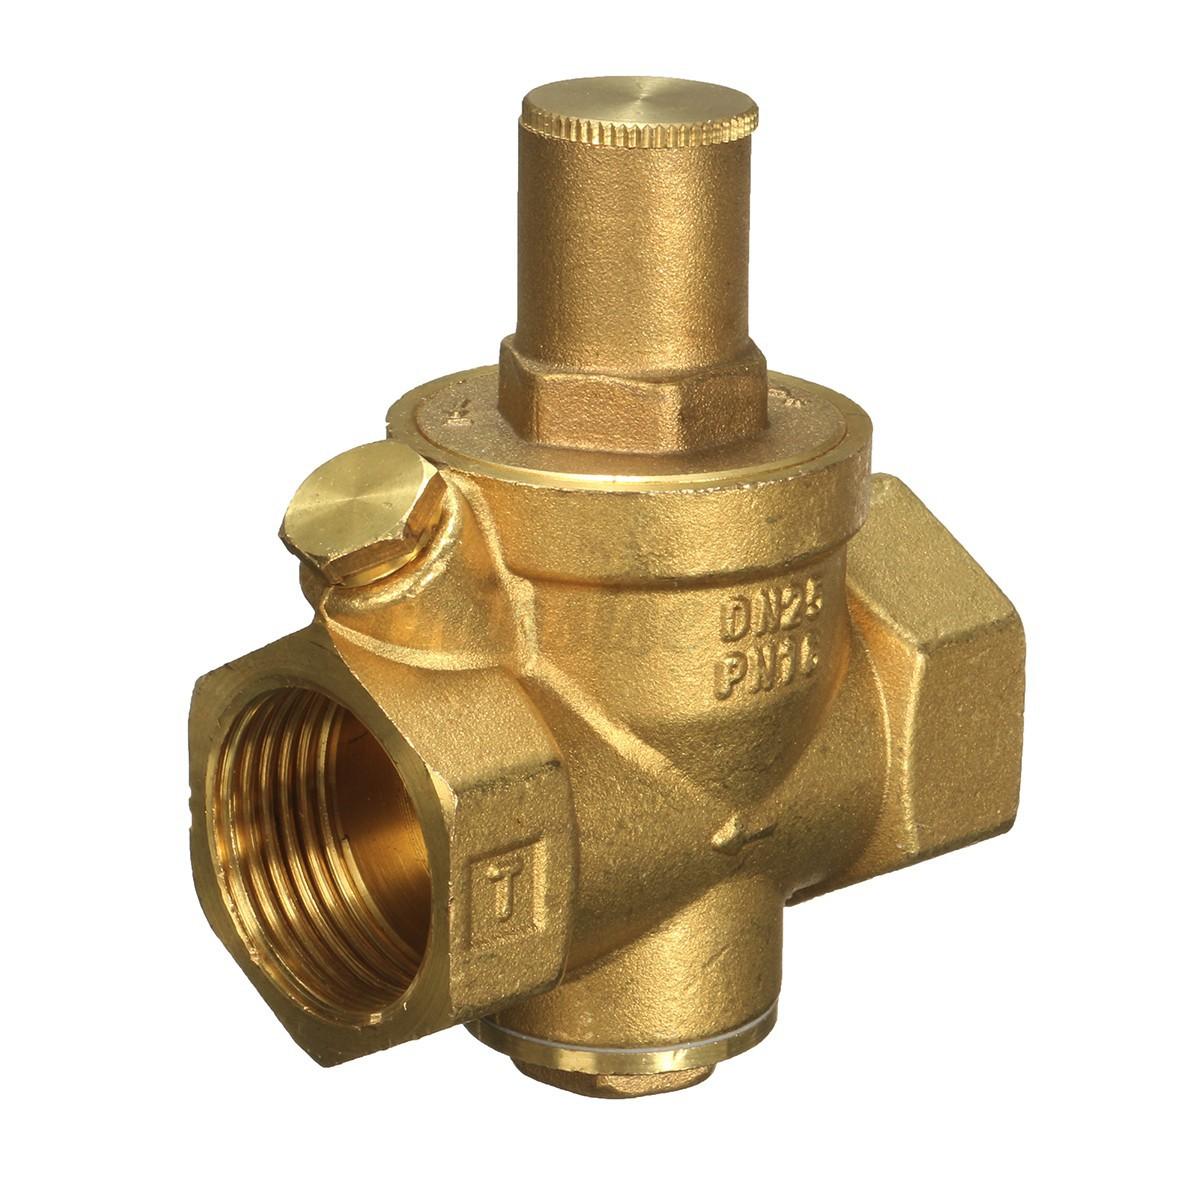 dn25 pressure reducing valve brass water flow with adjustable gauge wrench us ebay. Black Bedroom Furniture Sets. Home Design Ideas